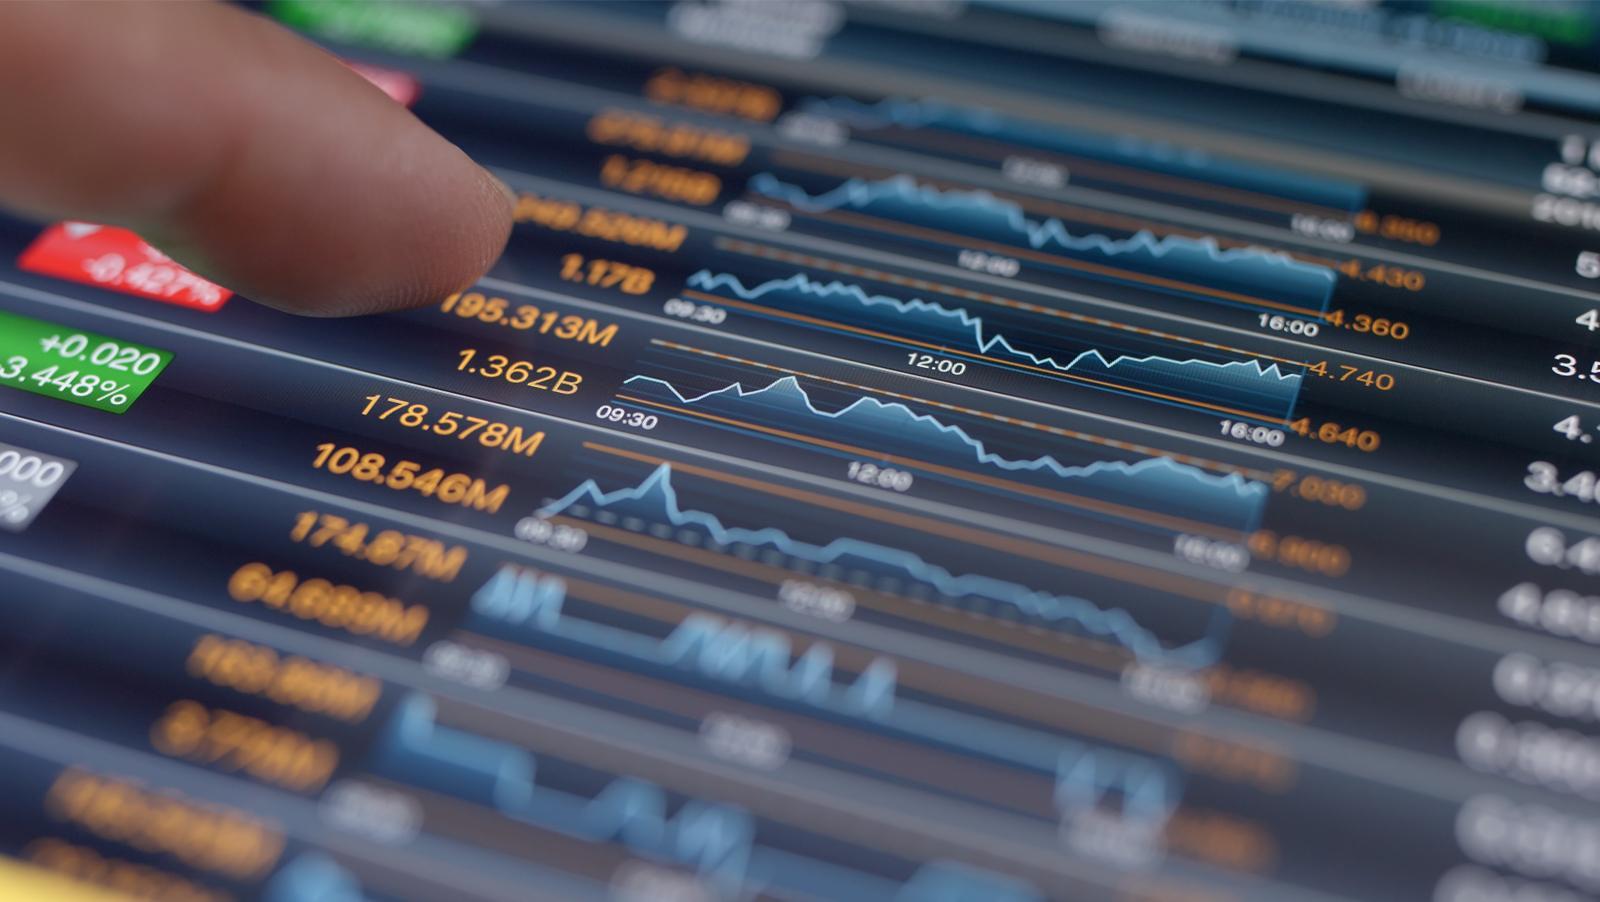 Regional gaming stocks in focus